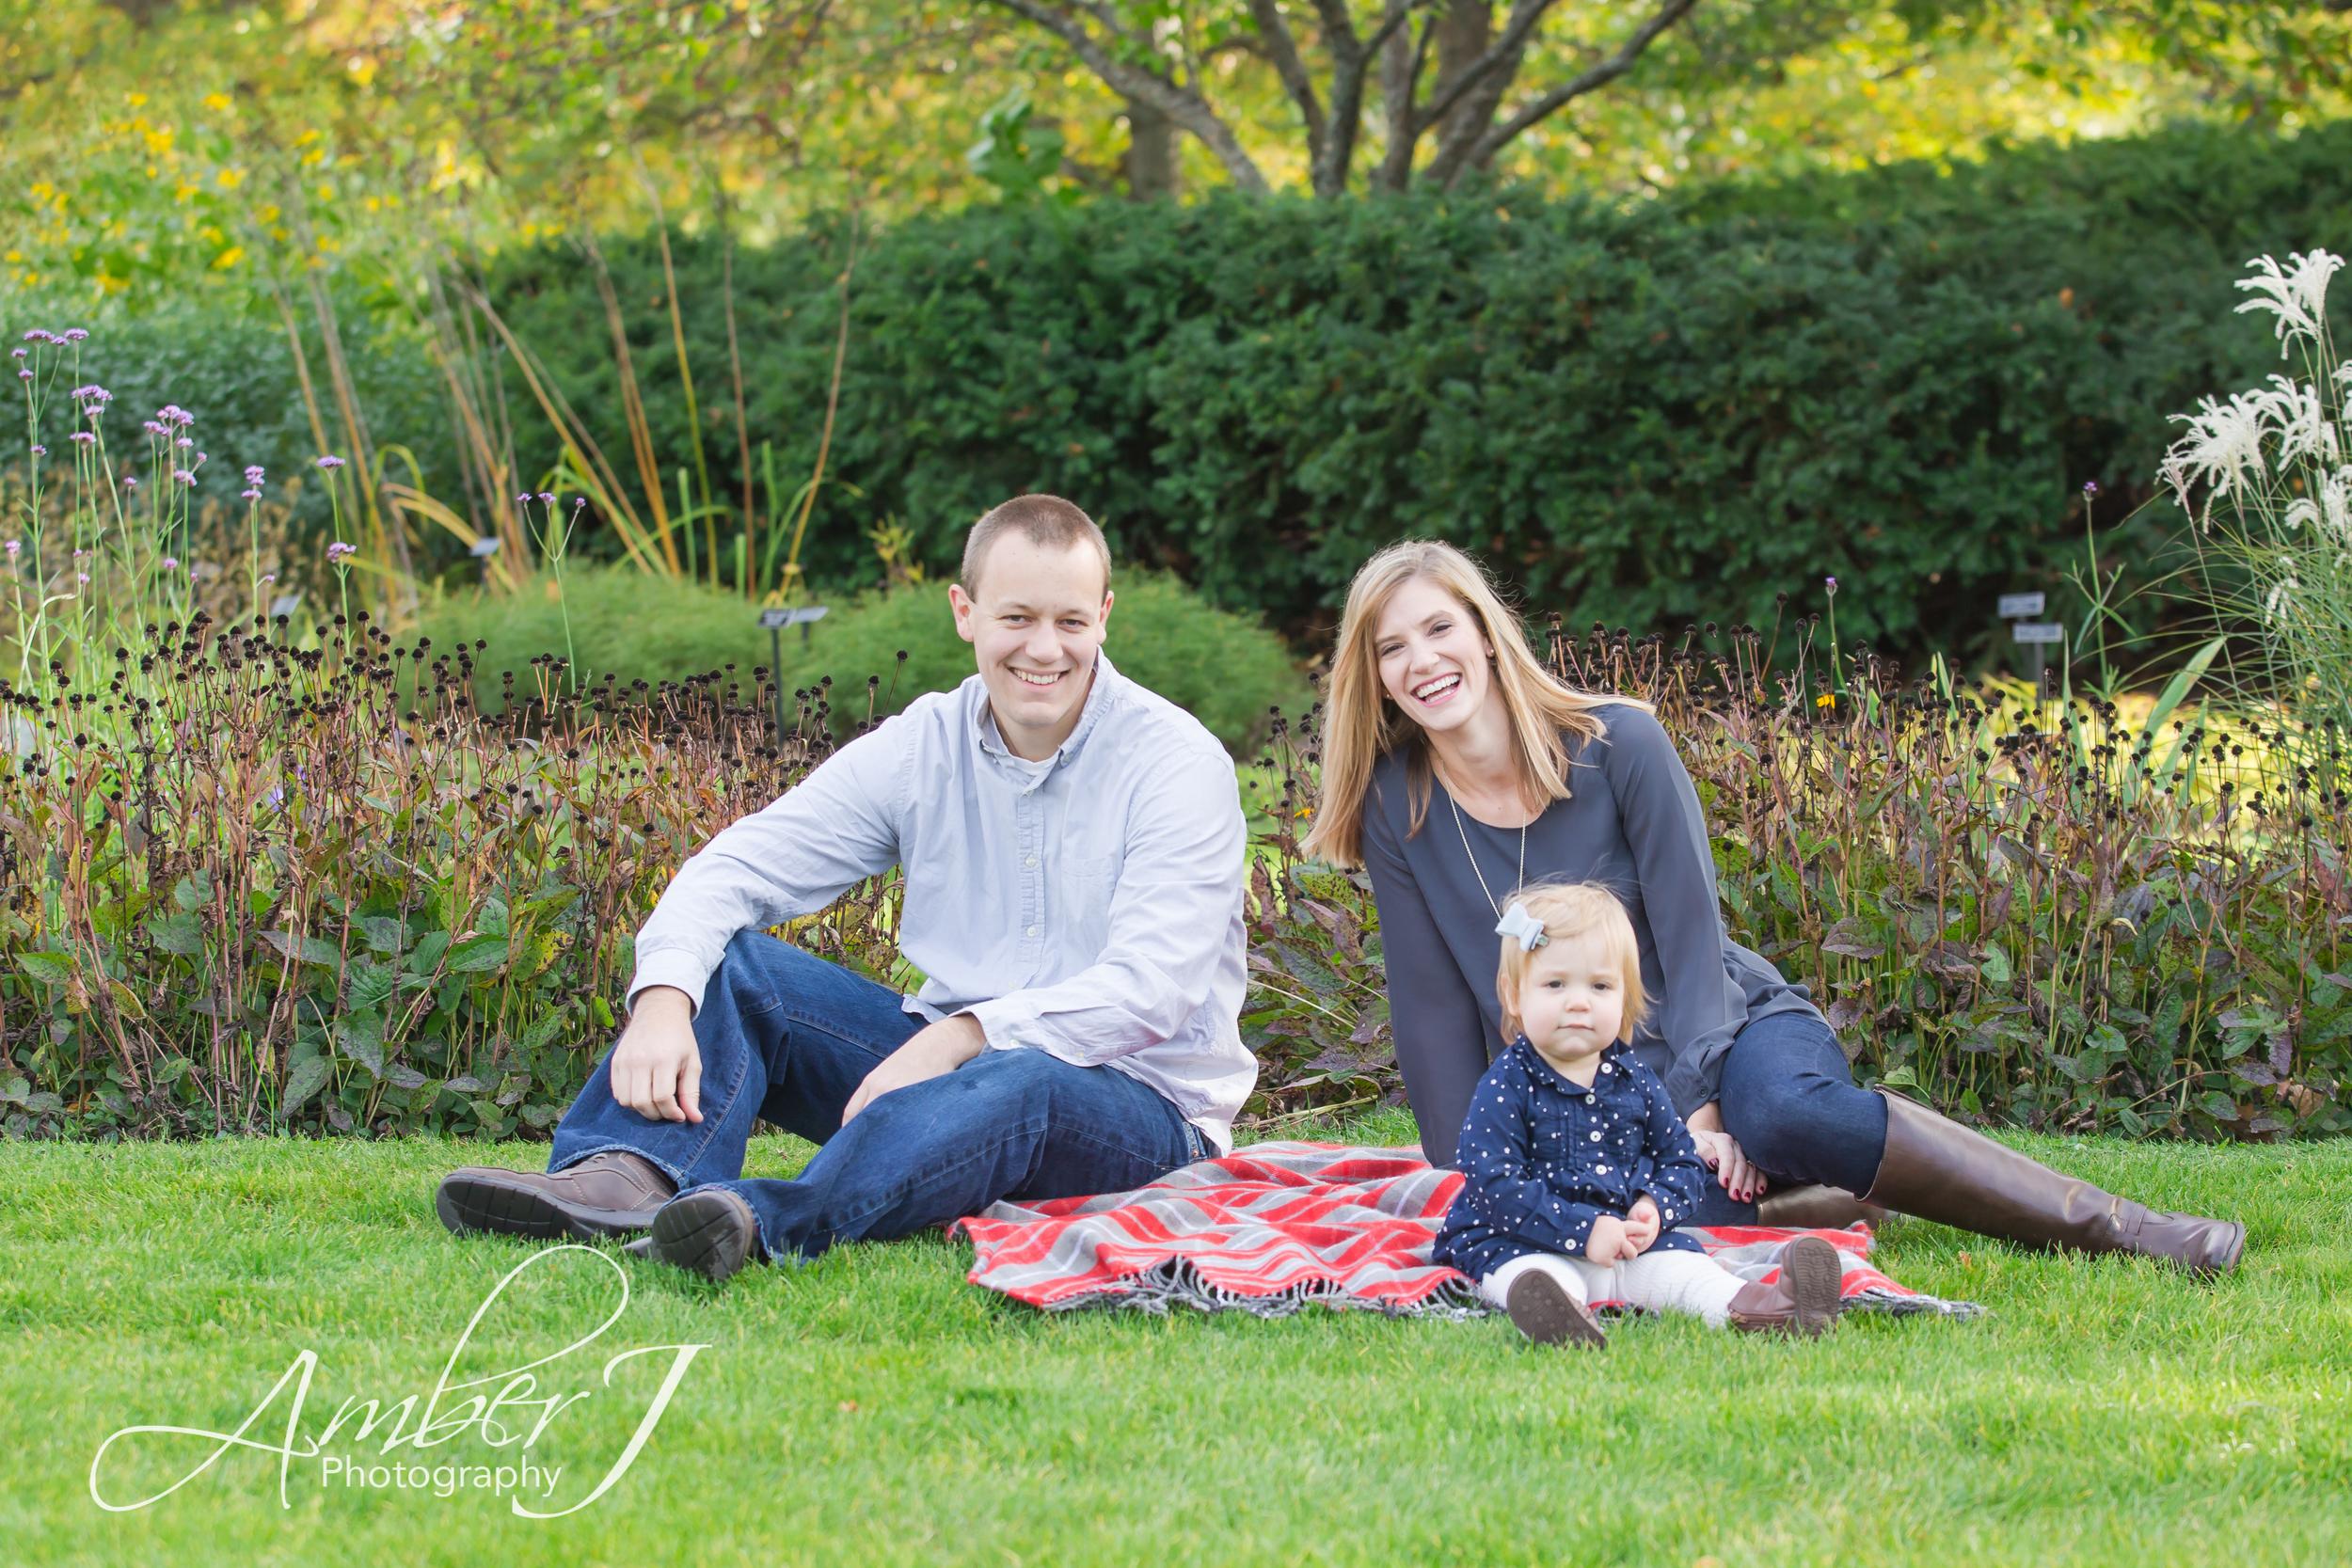 deitrickfamily_amberjphotograhy_blog-13.jpg